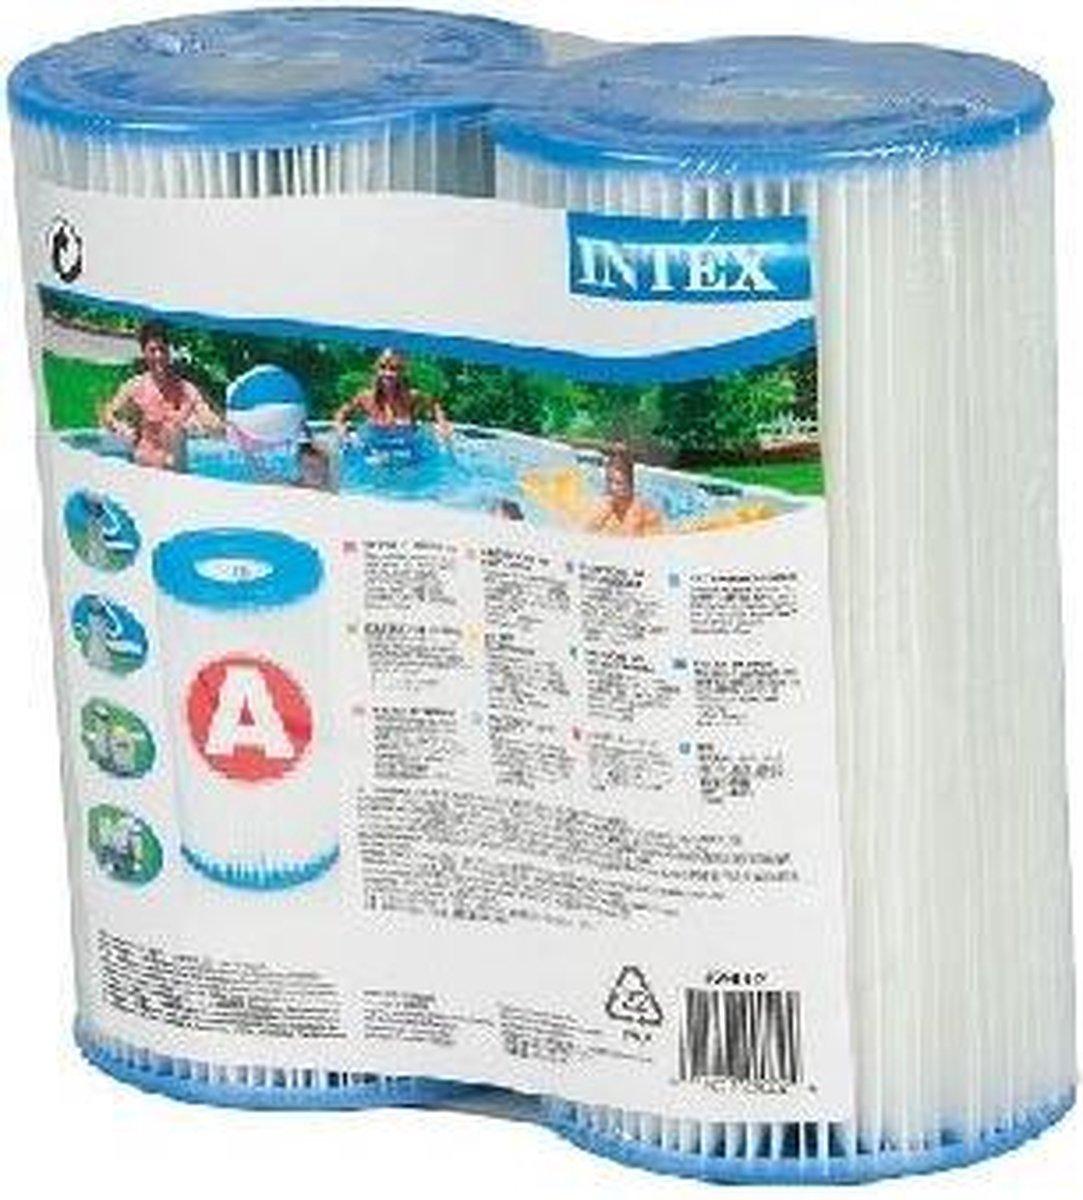 Intex Filter Cartridge Twin A